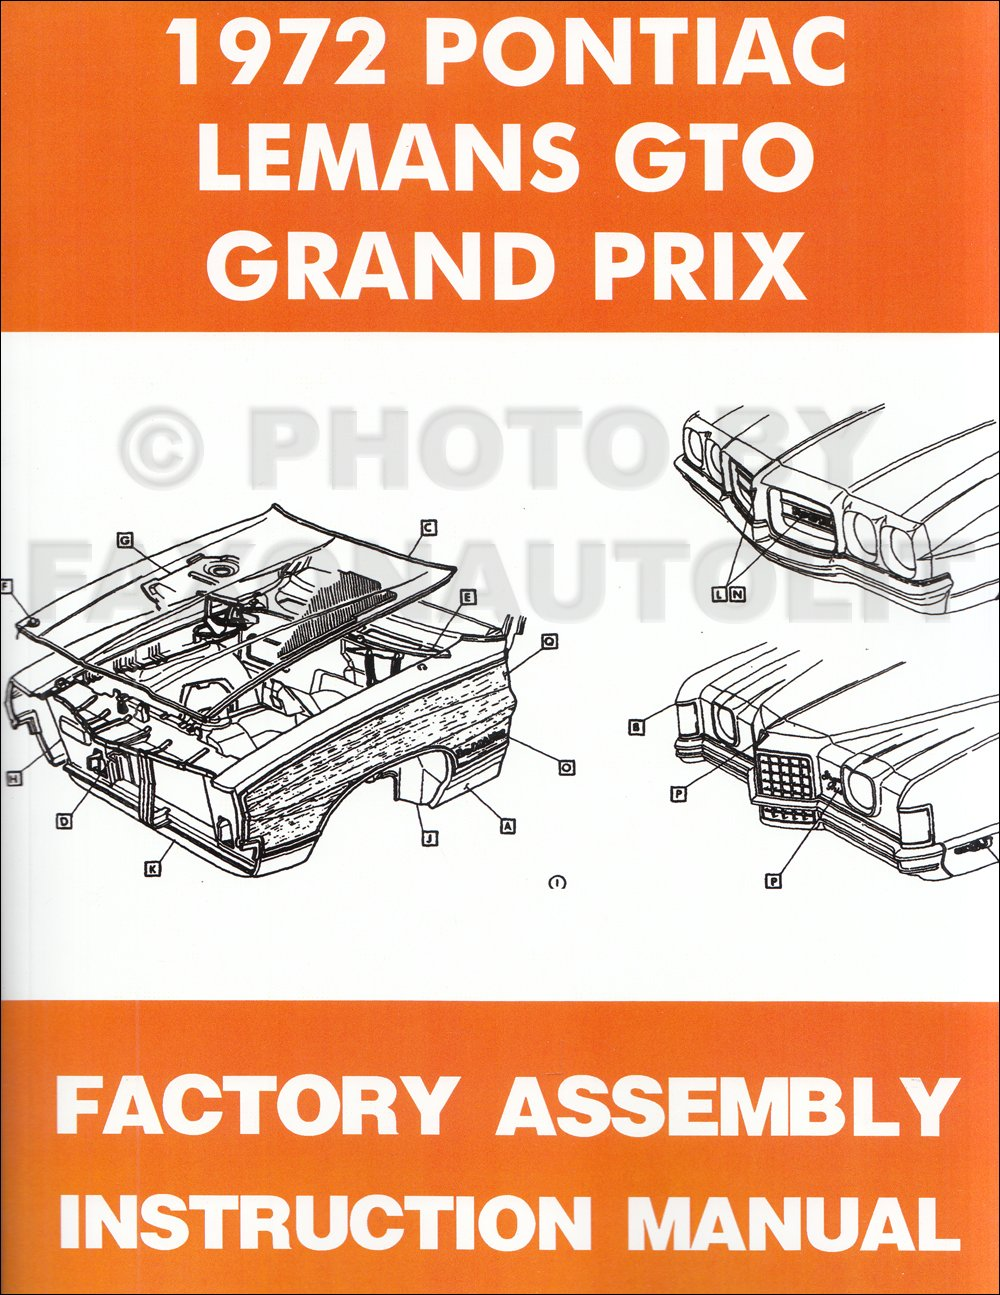 1972 Pontiac Lemans Gto And Grand Prix Assembly Manual Reprint Wiring Books